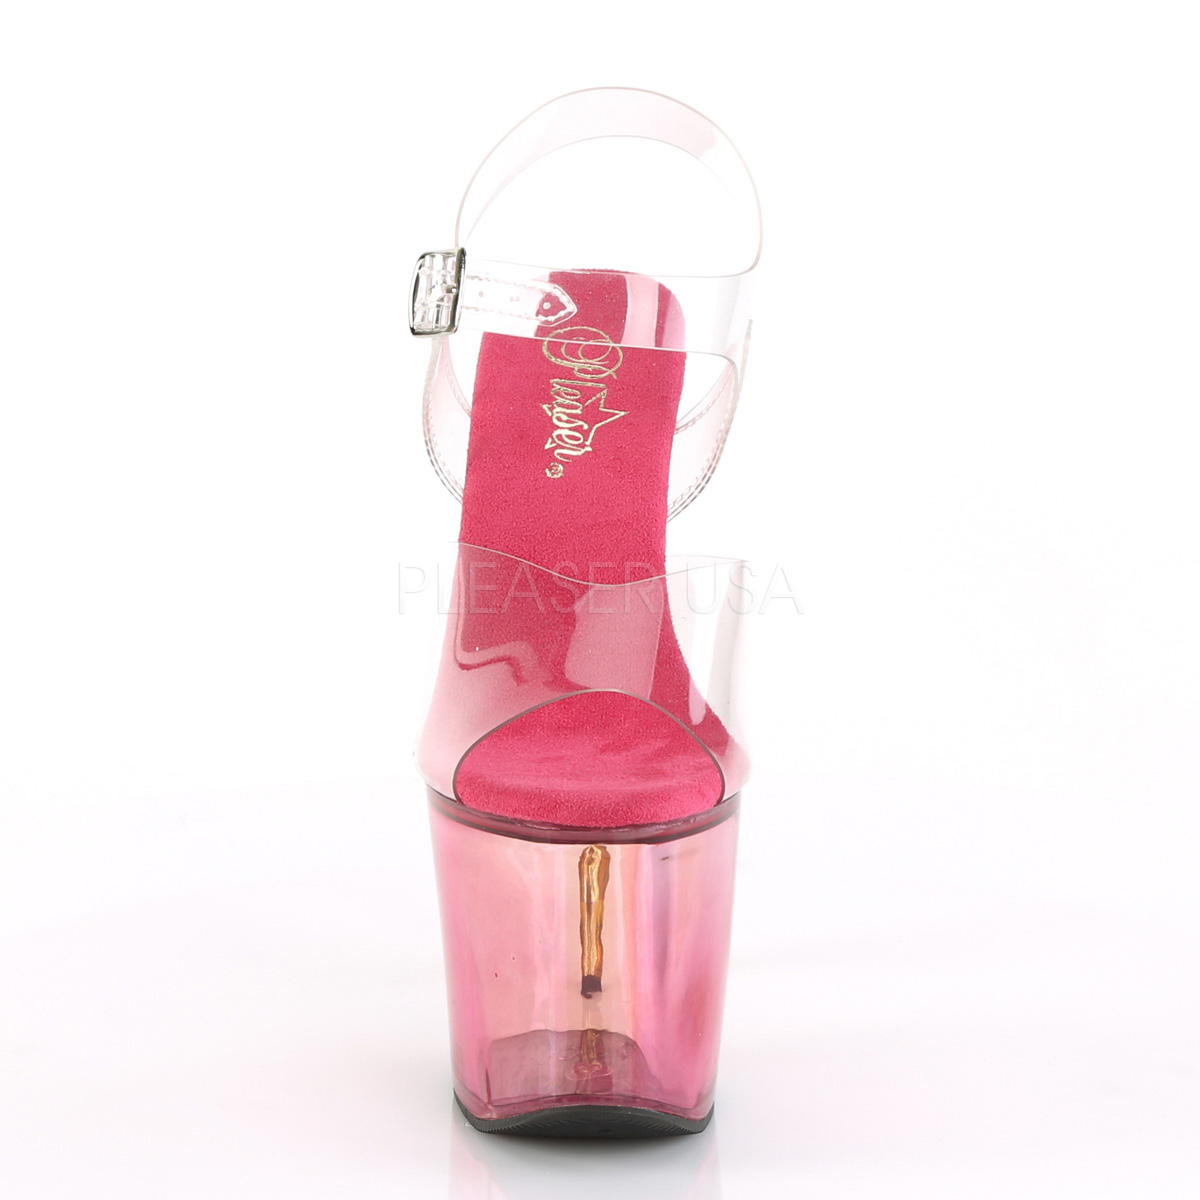 rosa 18 cm SCALLOP 708MCT platform høyhælte sko